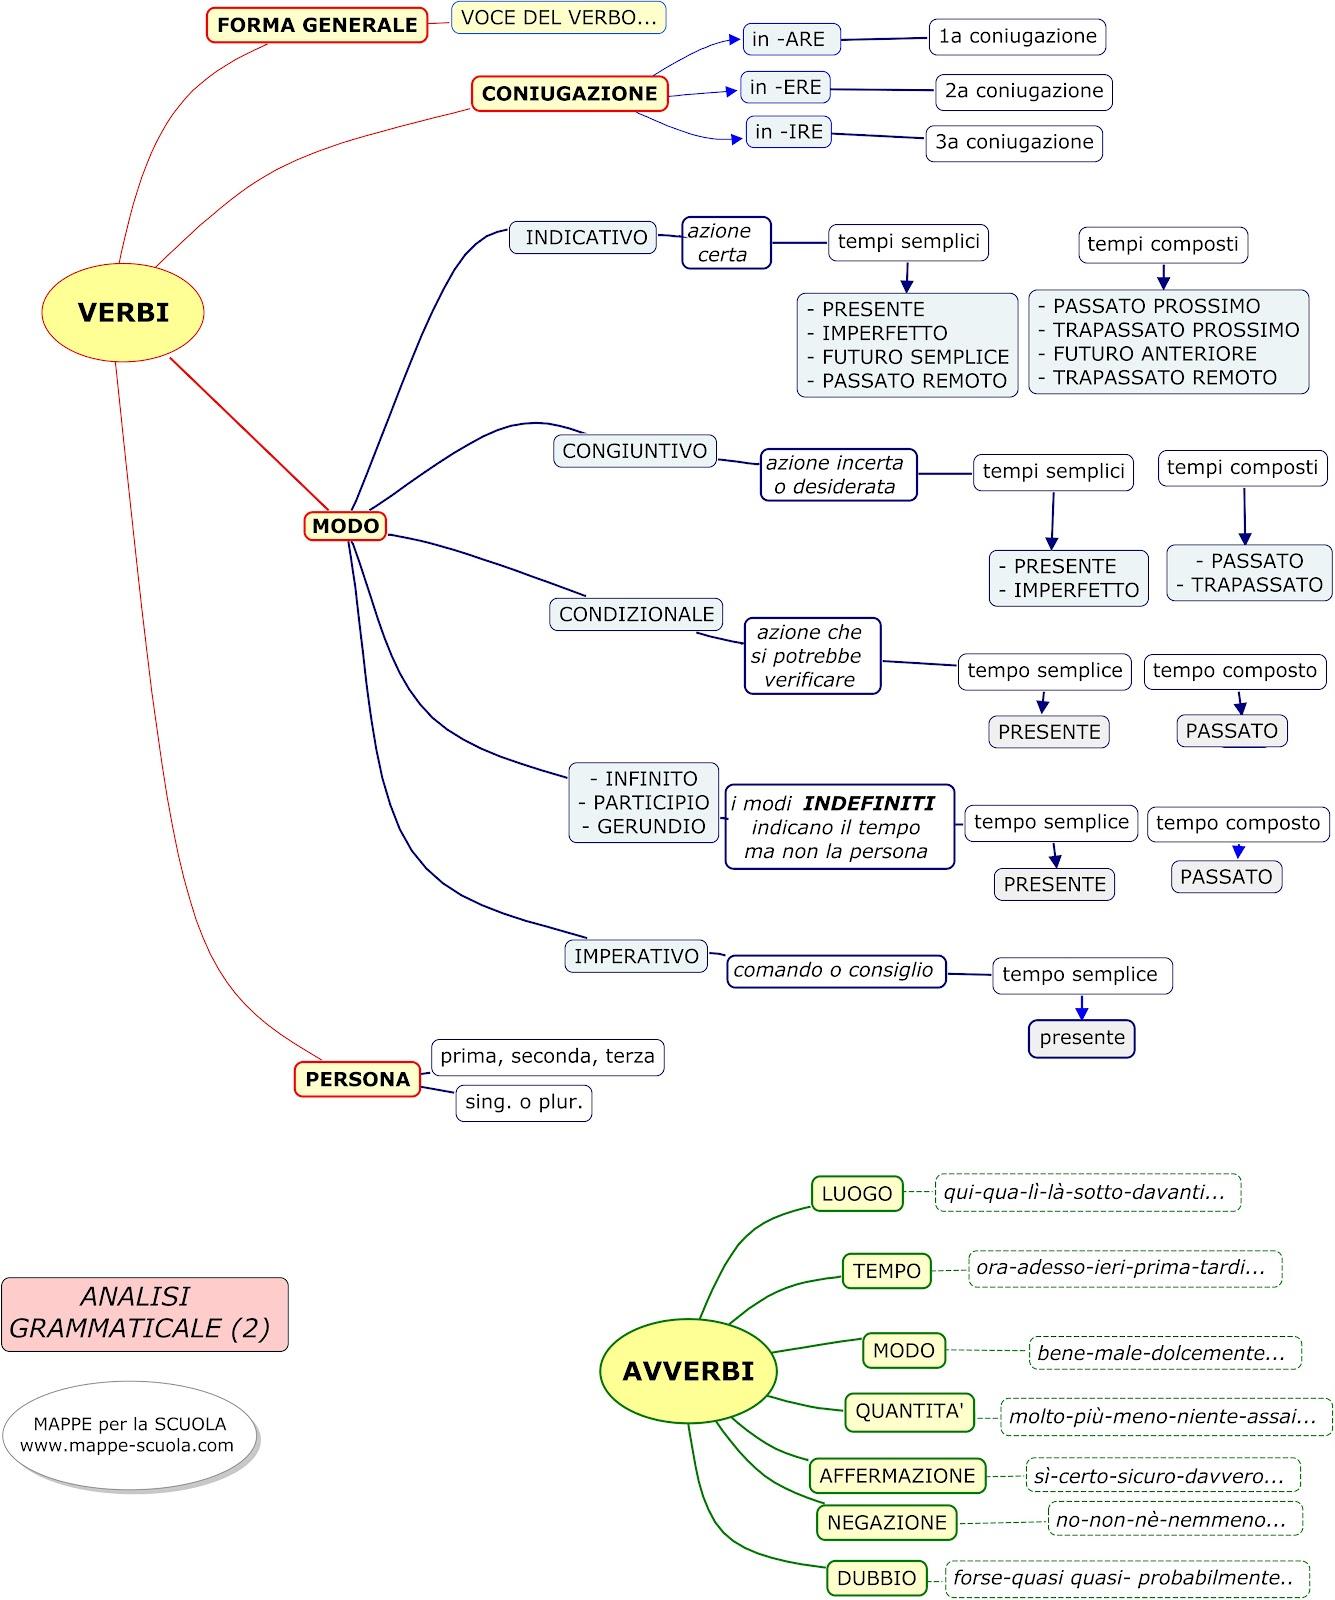 spesso MAPPE ITALIANO – MAPPE GRAMMATICA : MORFOLOGIA-ANALISI  BG58